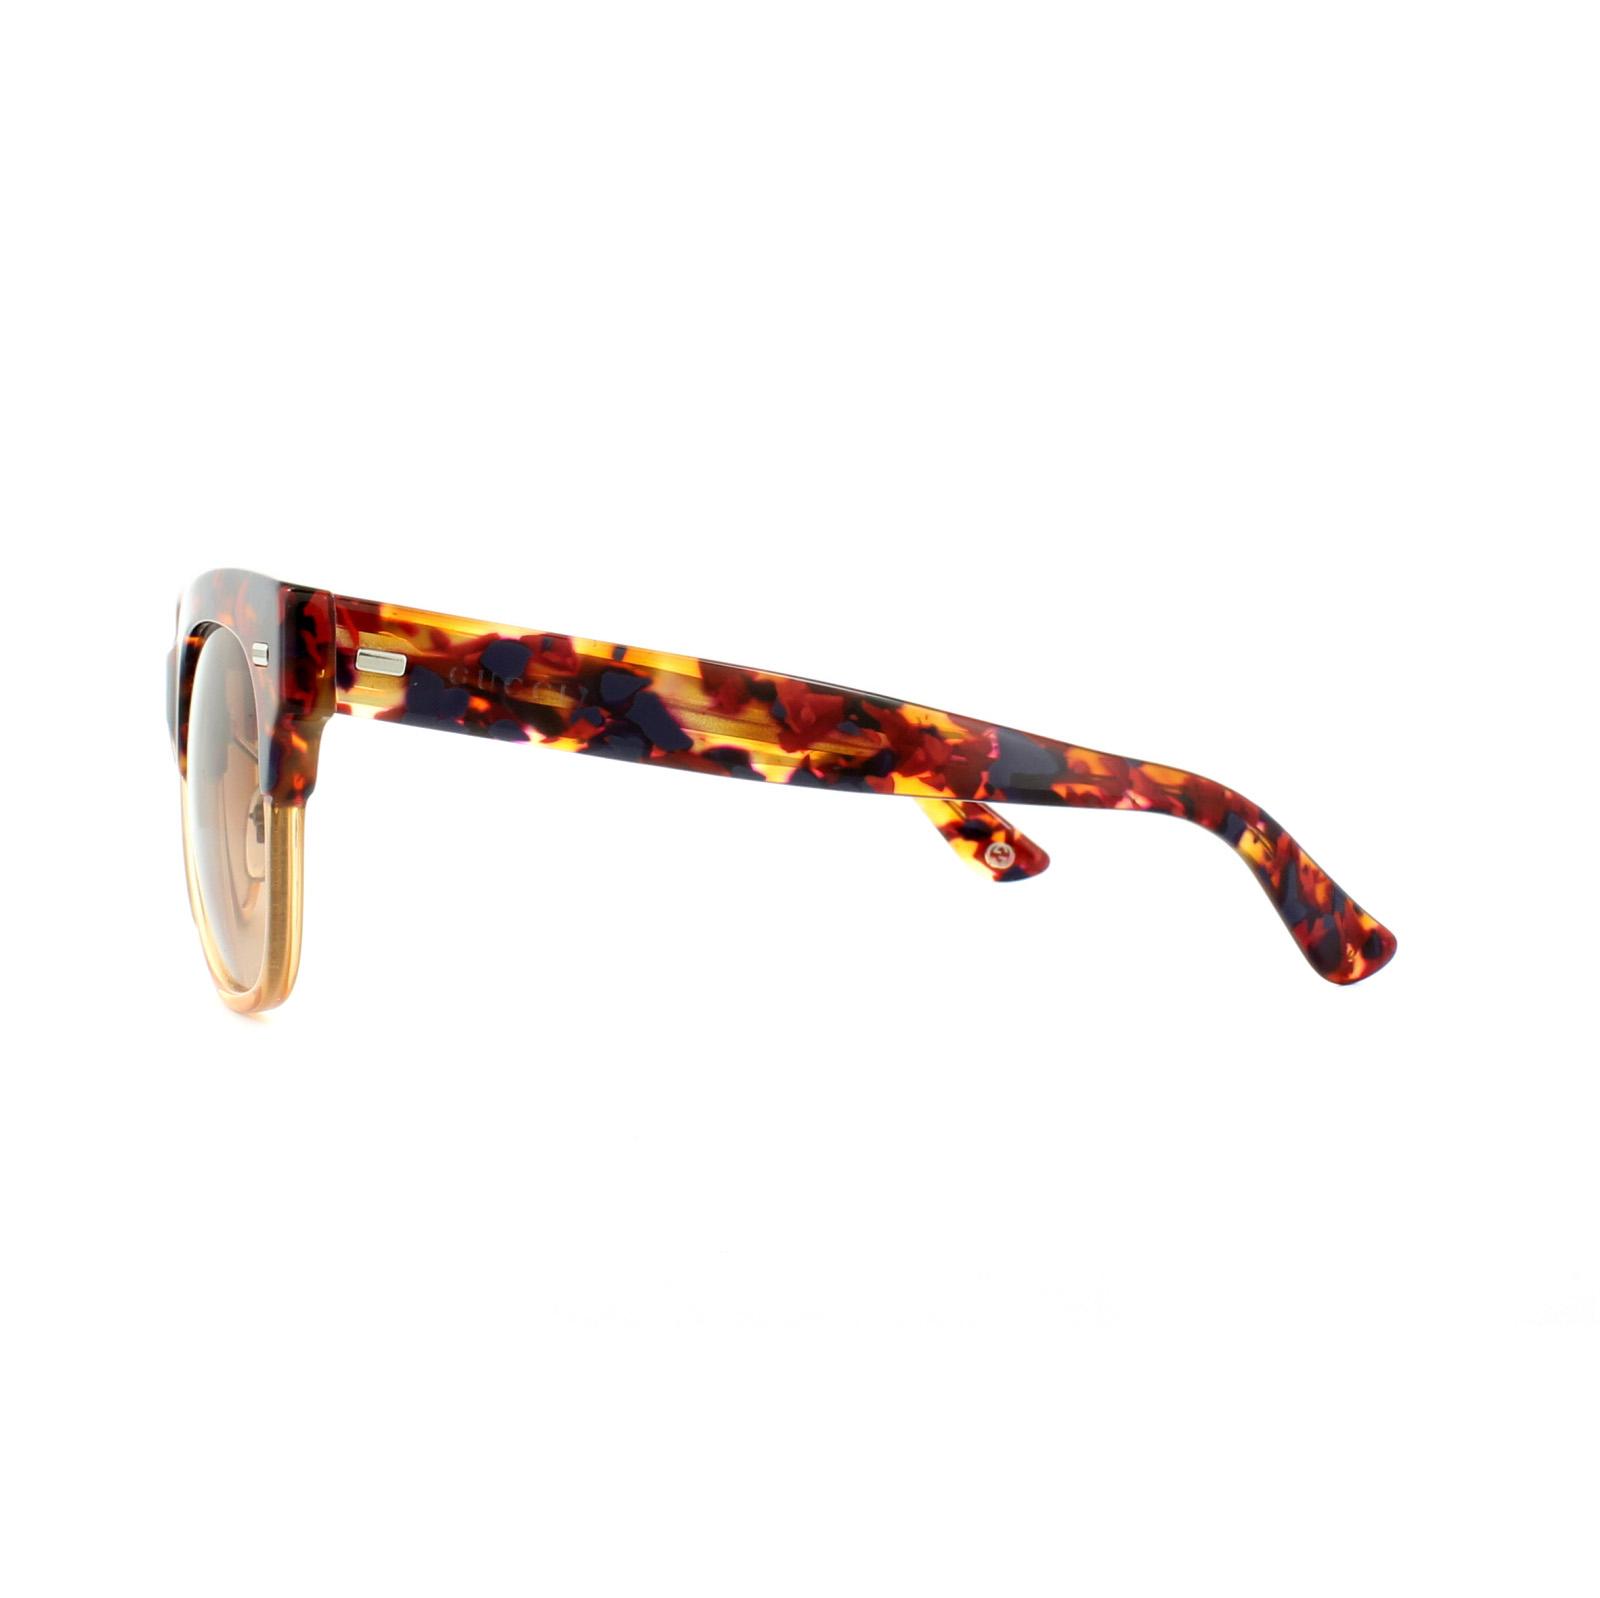 0493775ec7a Sentinel Gucci Sunglasses 3744 XC4 63 Red Havana Honey Brown Gradient